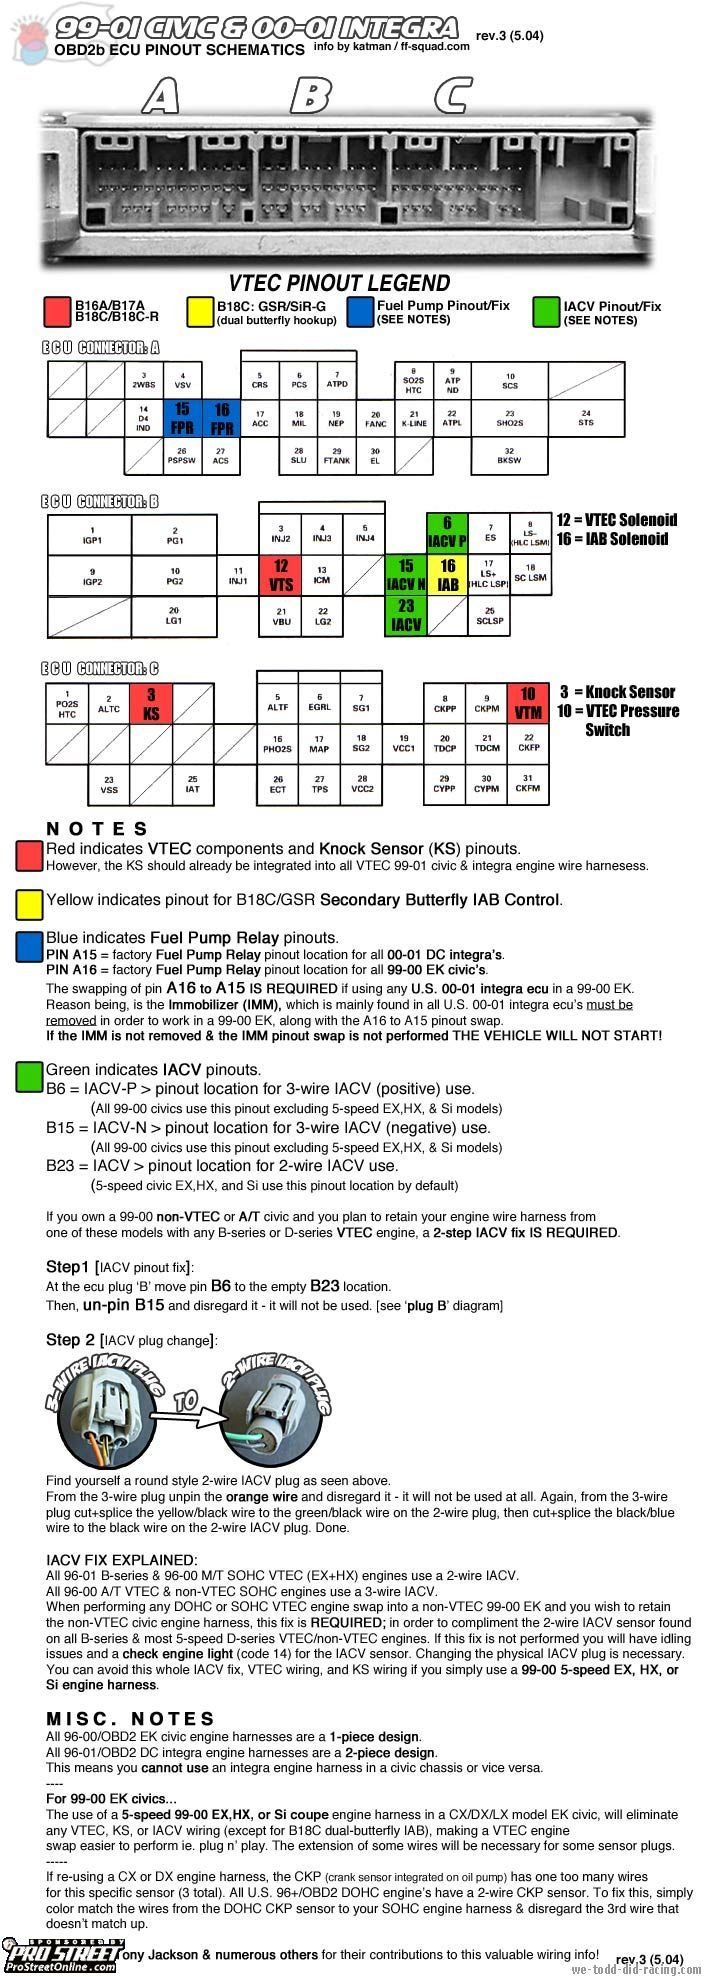 How To Build A Quot Reliable Quot Lsvtec B20vtec Hondaswap